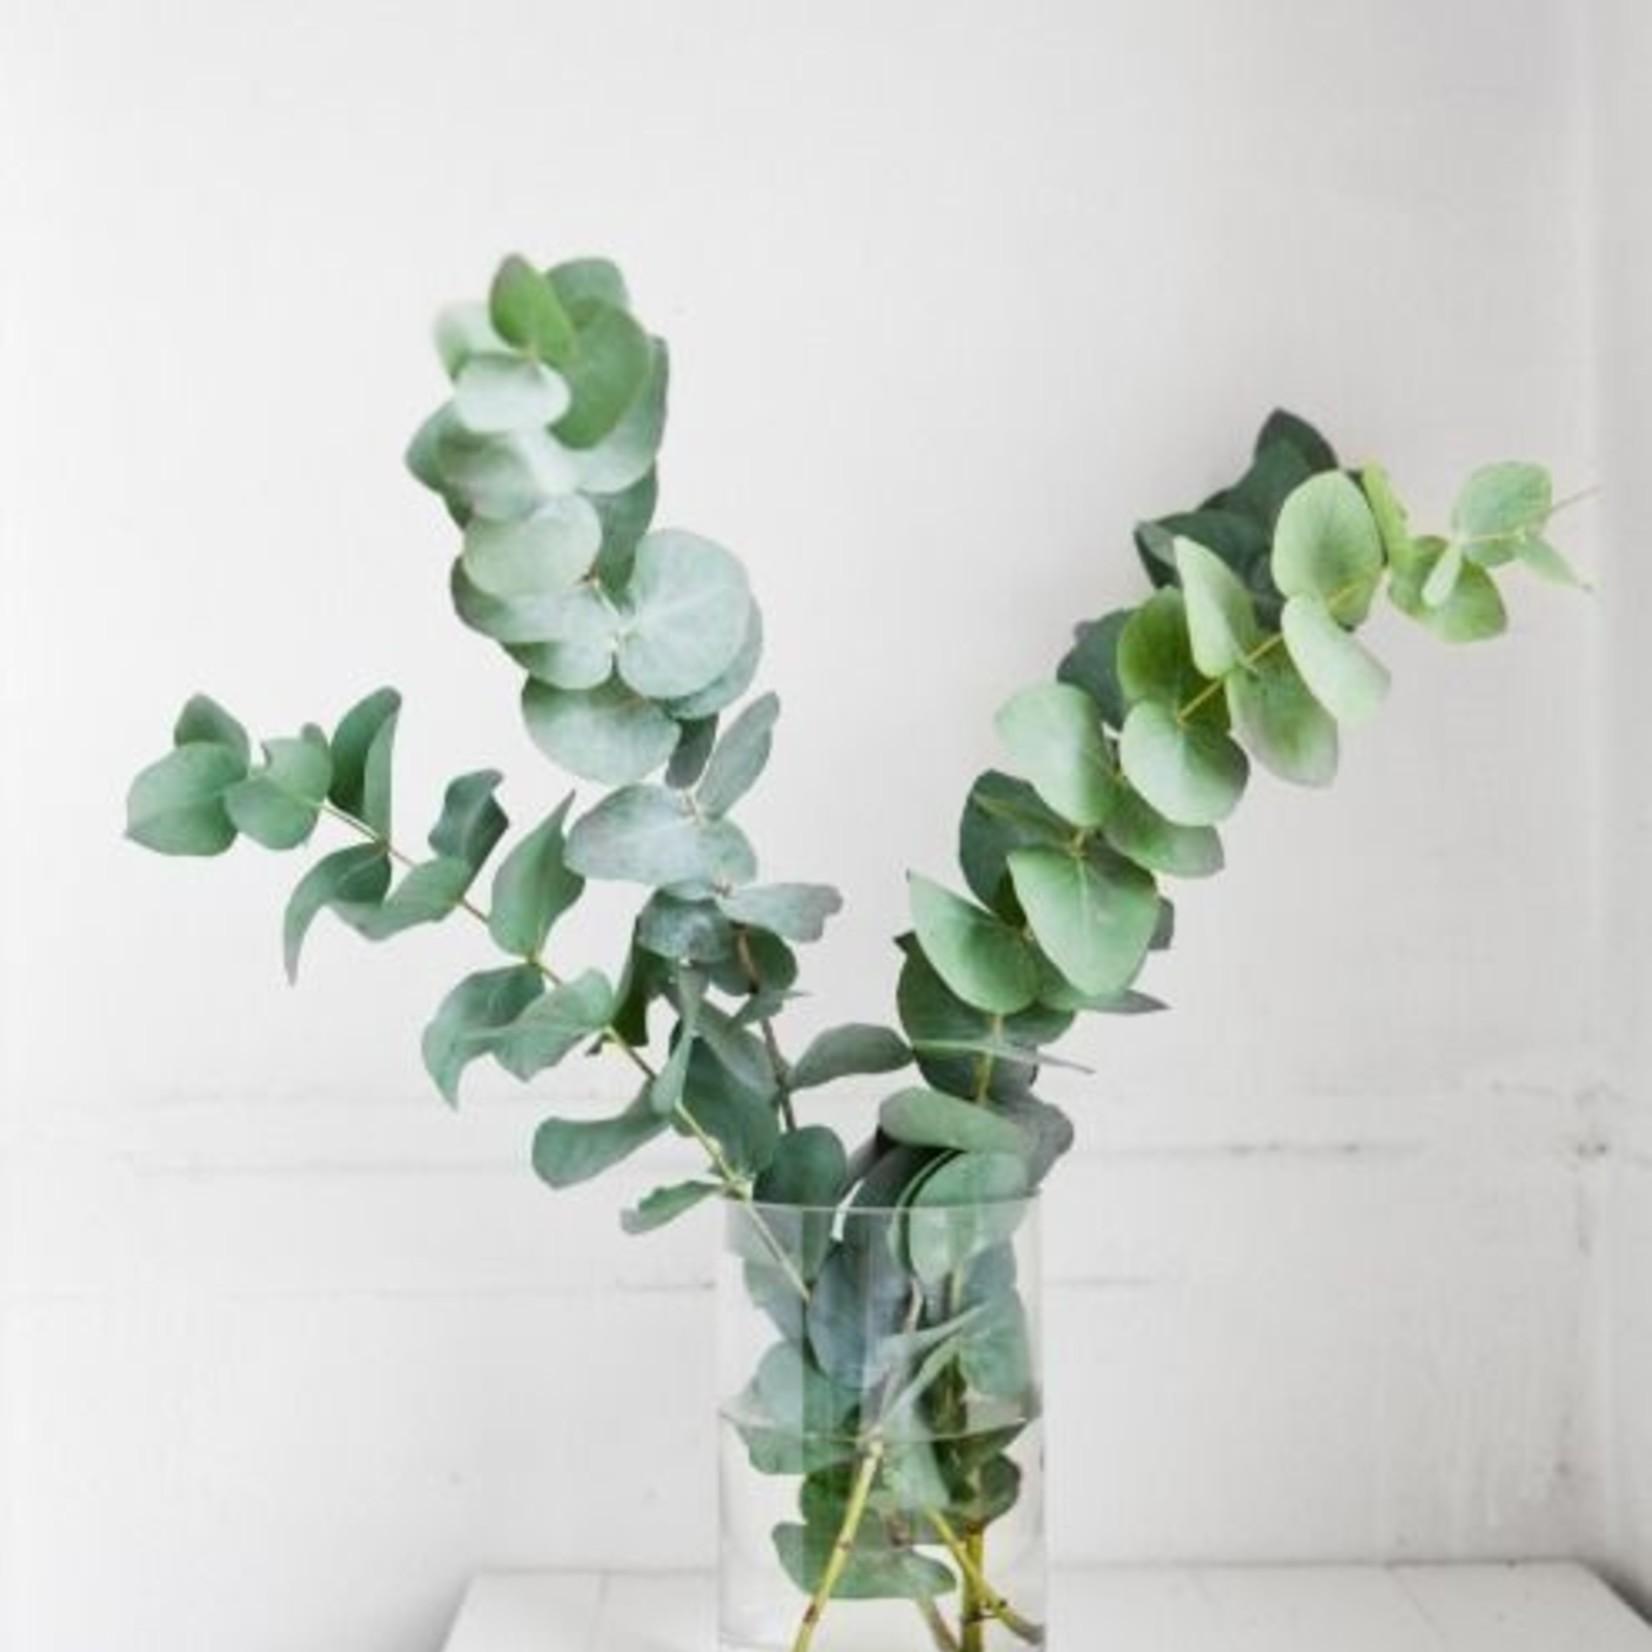 Three hundred grams of fresh green eucalyptus as Solo bouquet